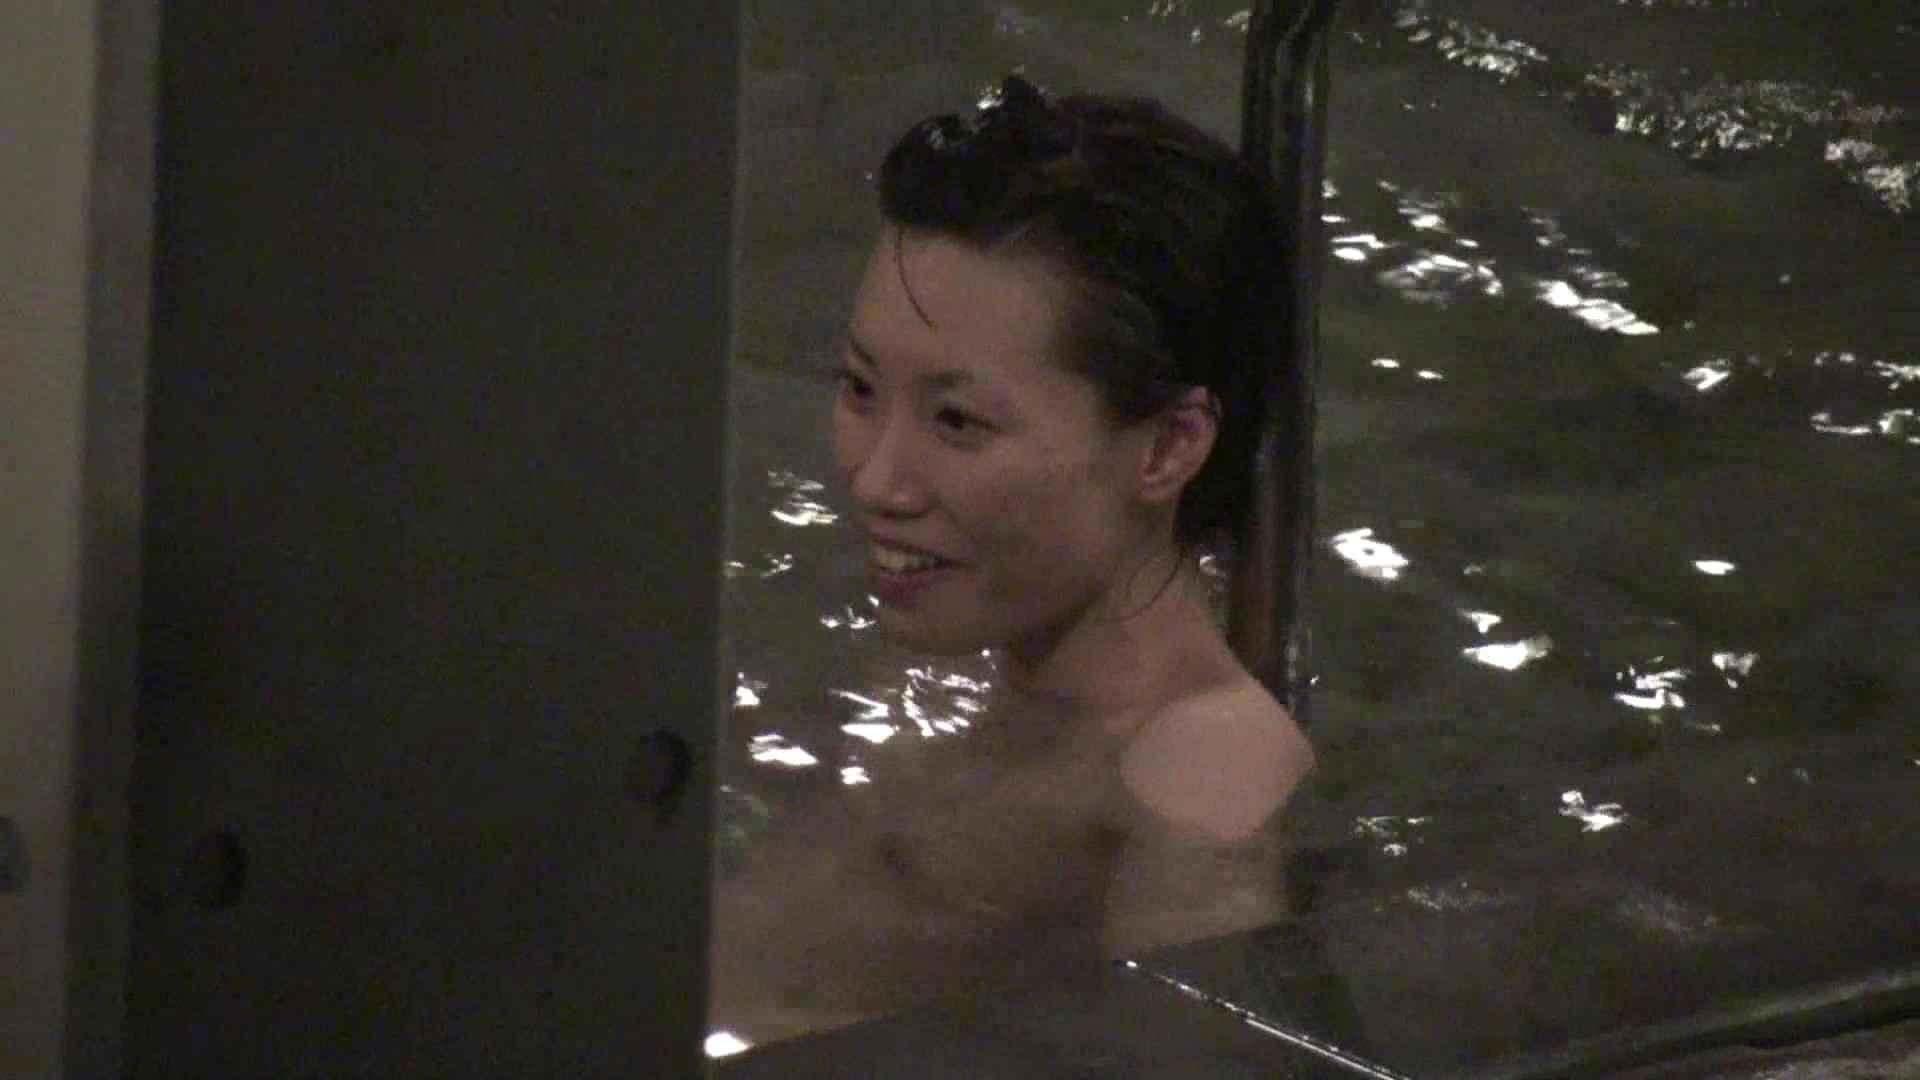 Aquaな露天風呂Vol.429 露天風呂編  111PIX 76